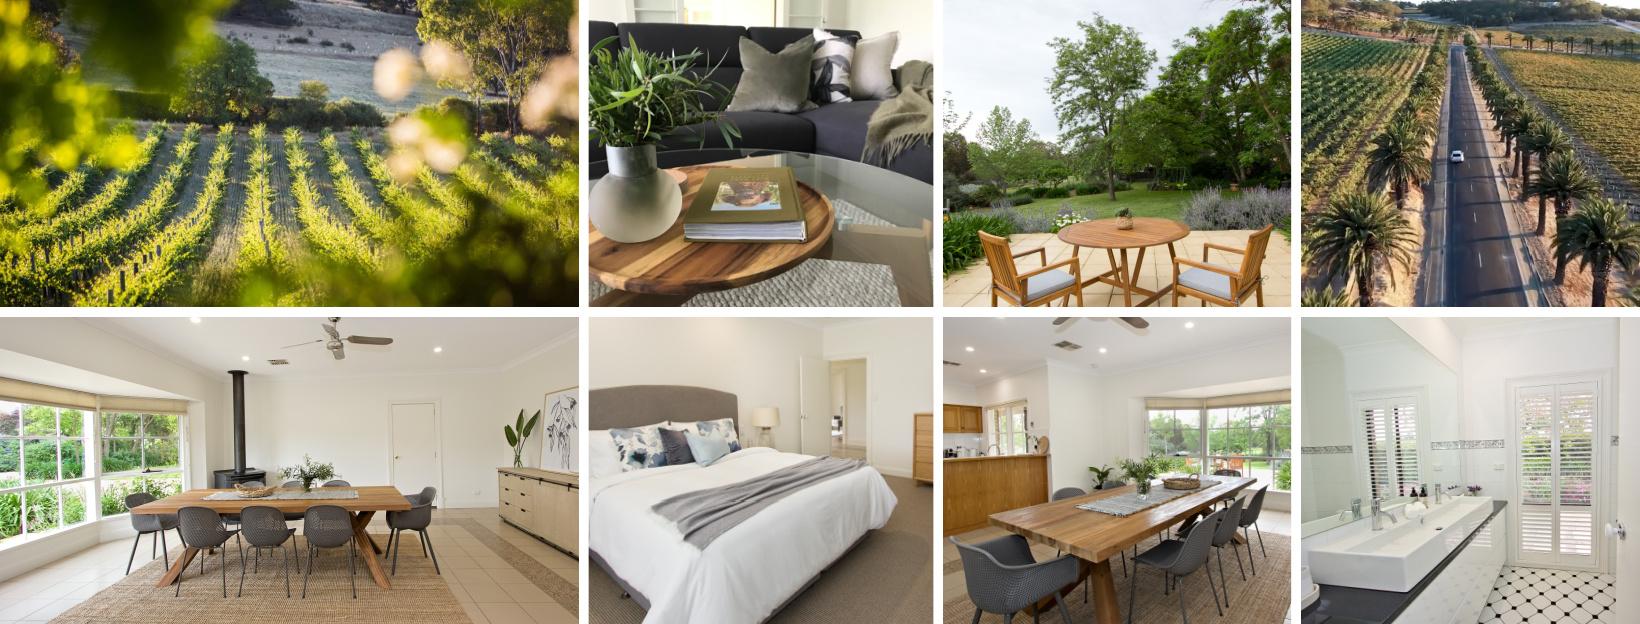 Seppeltsfield Vineyard Retreat,premium group accommodation in Seppeltsfield, Barossa, South Australia